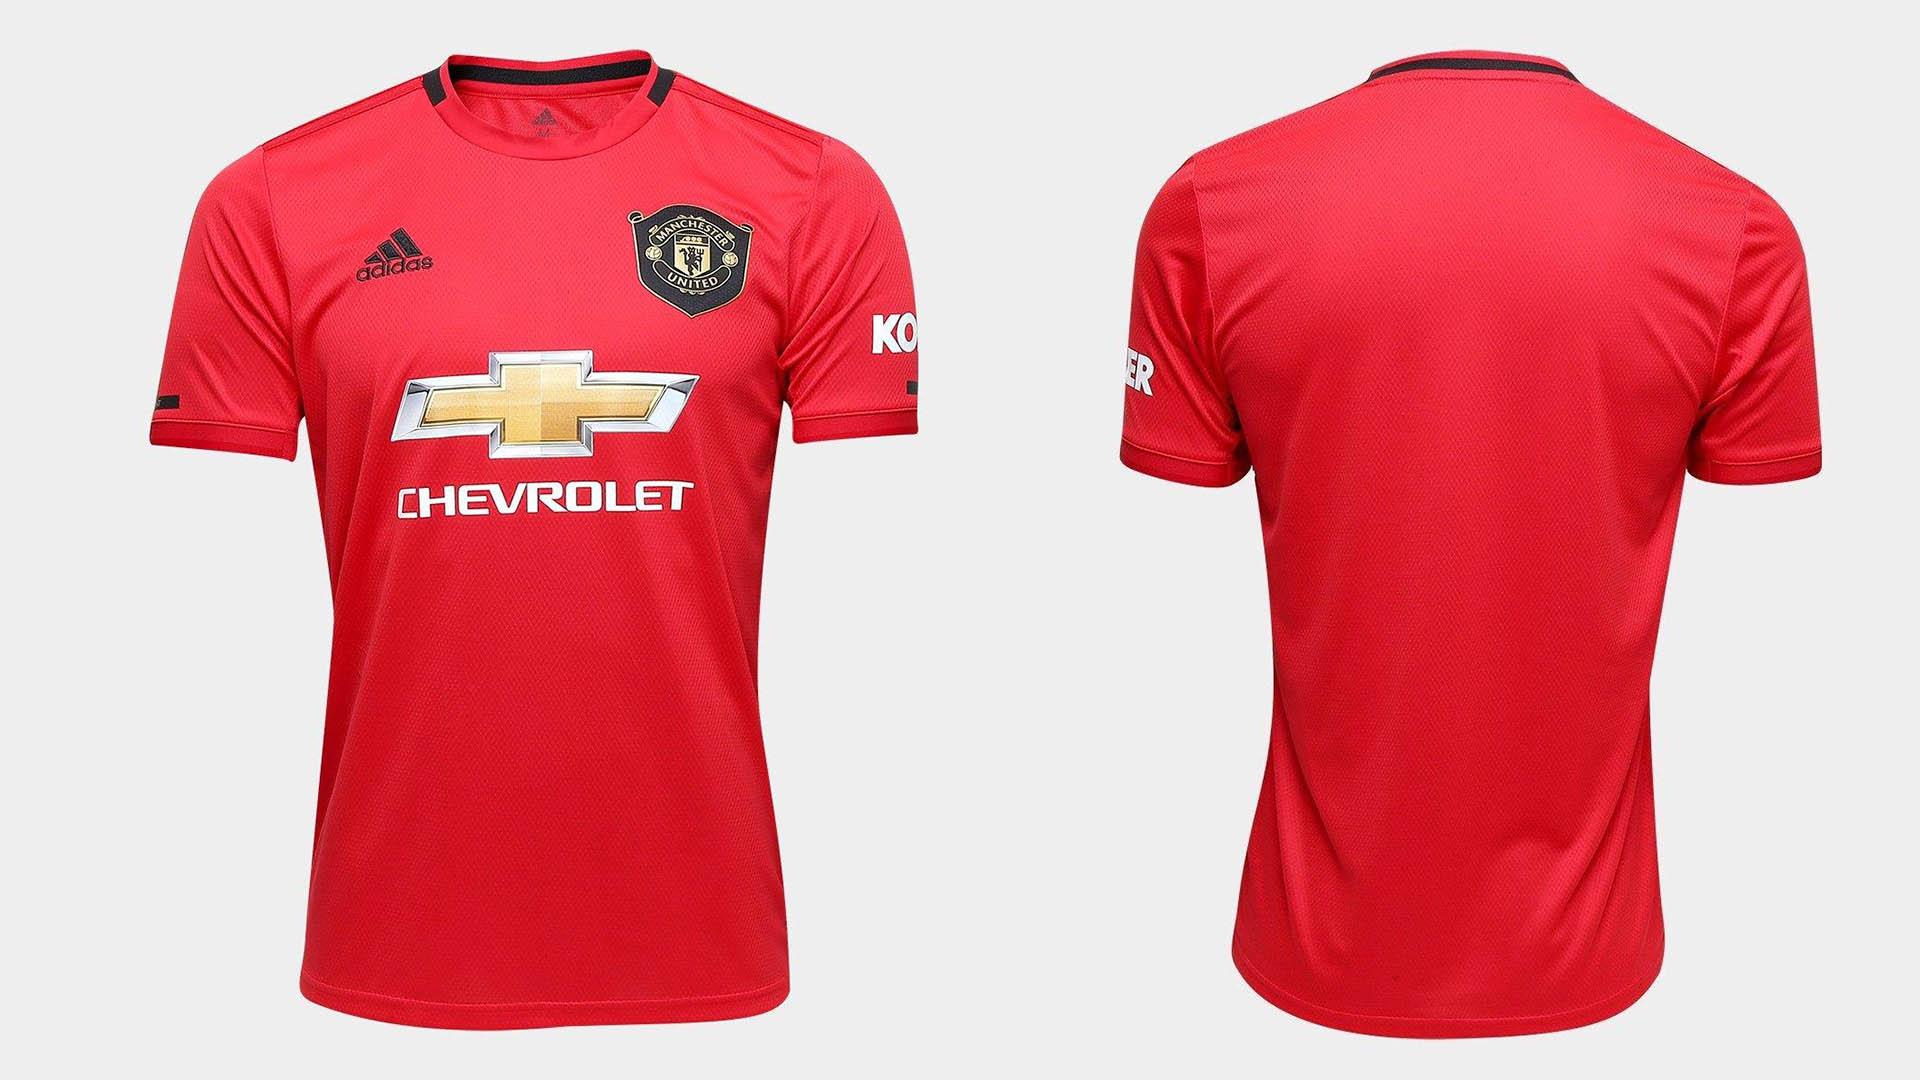 uniforme titular manchester united 2019 20